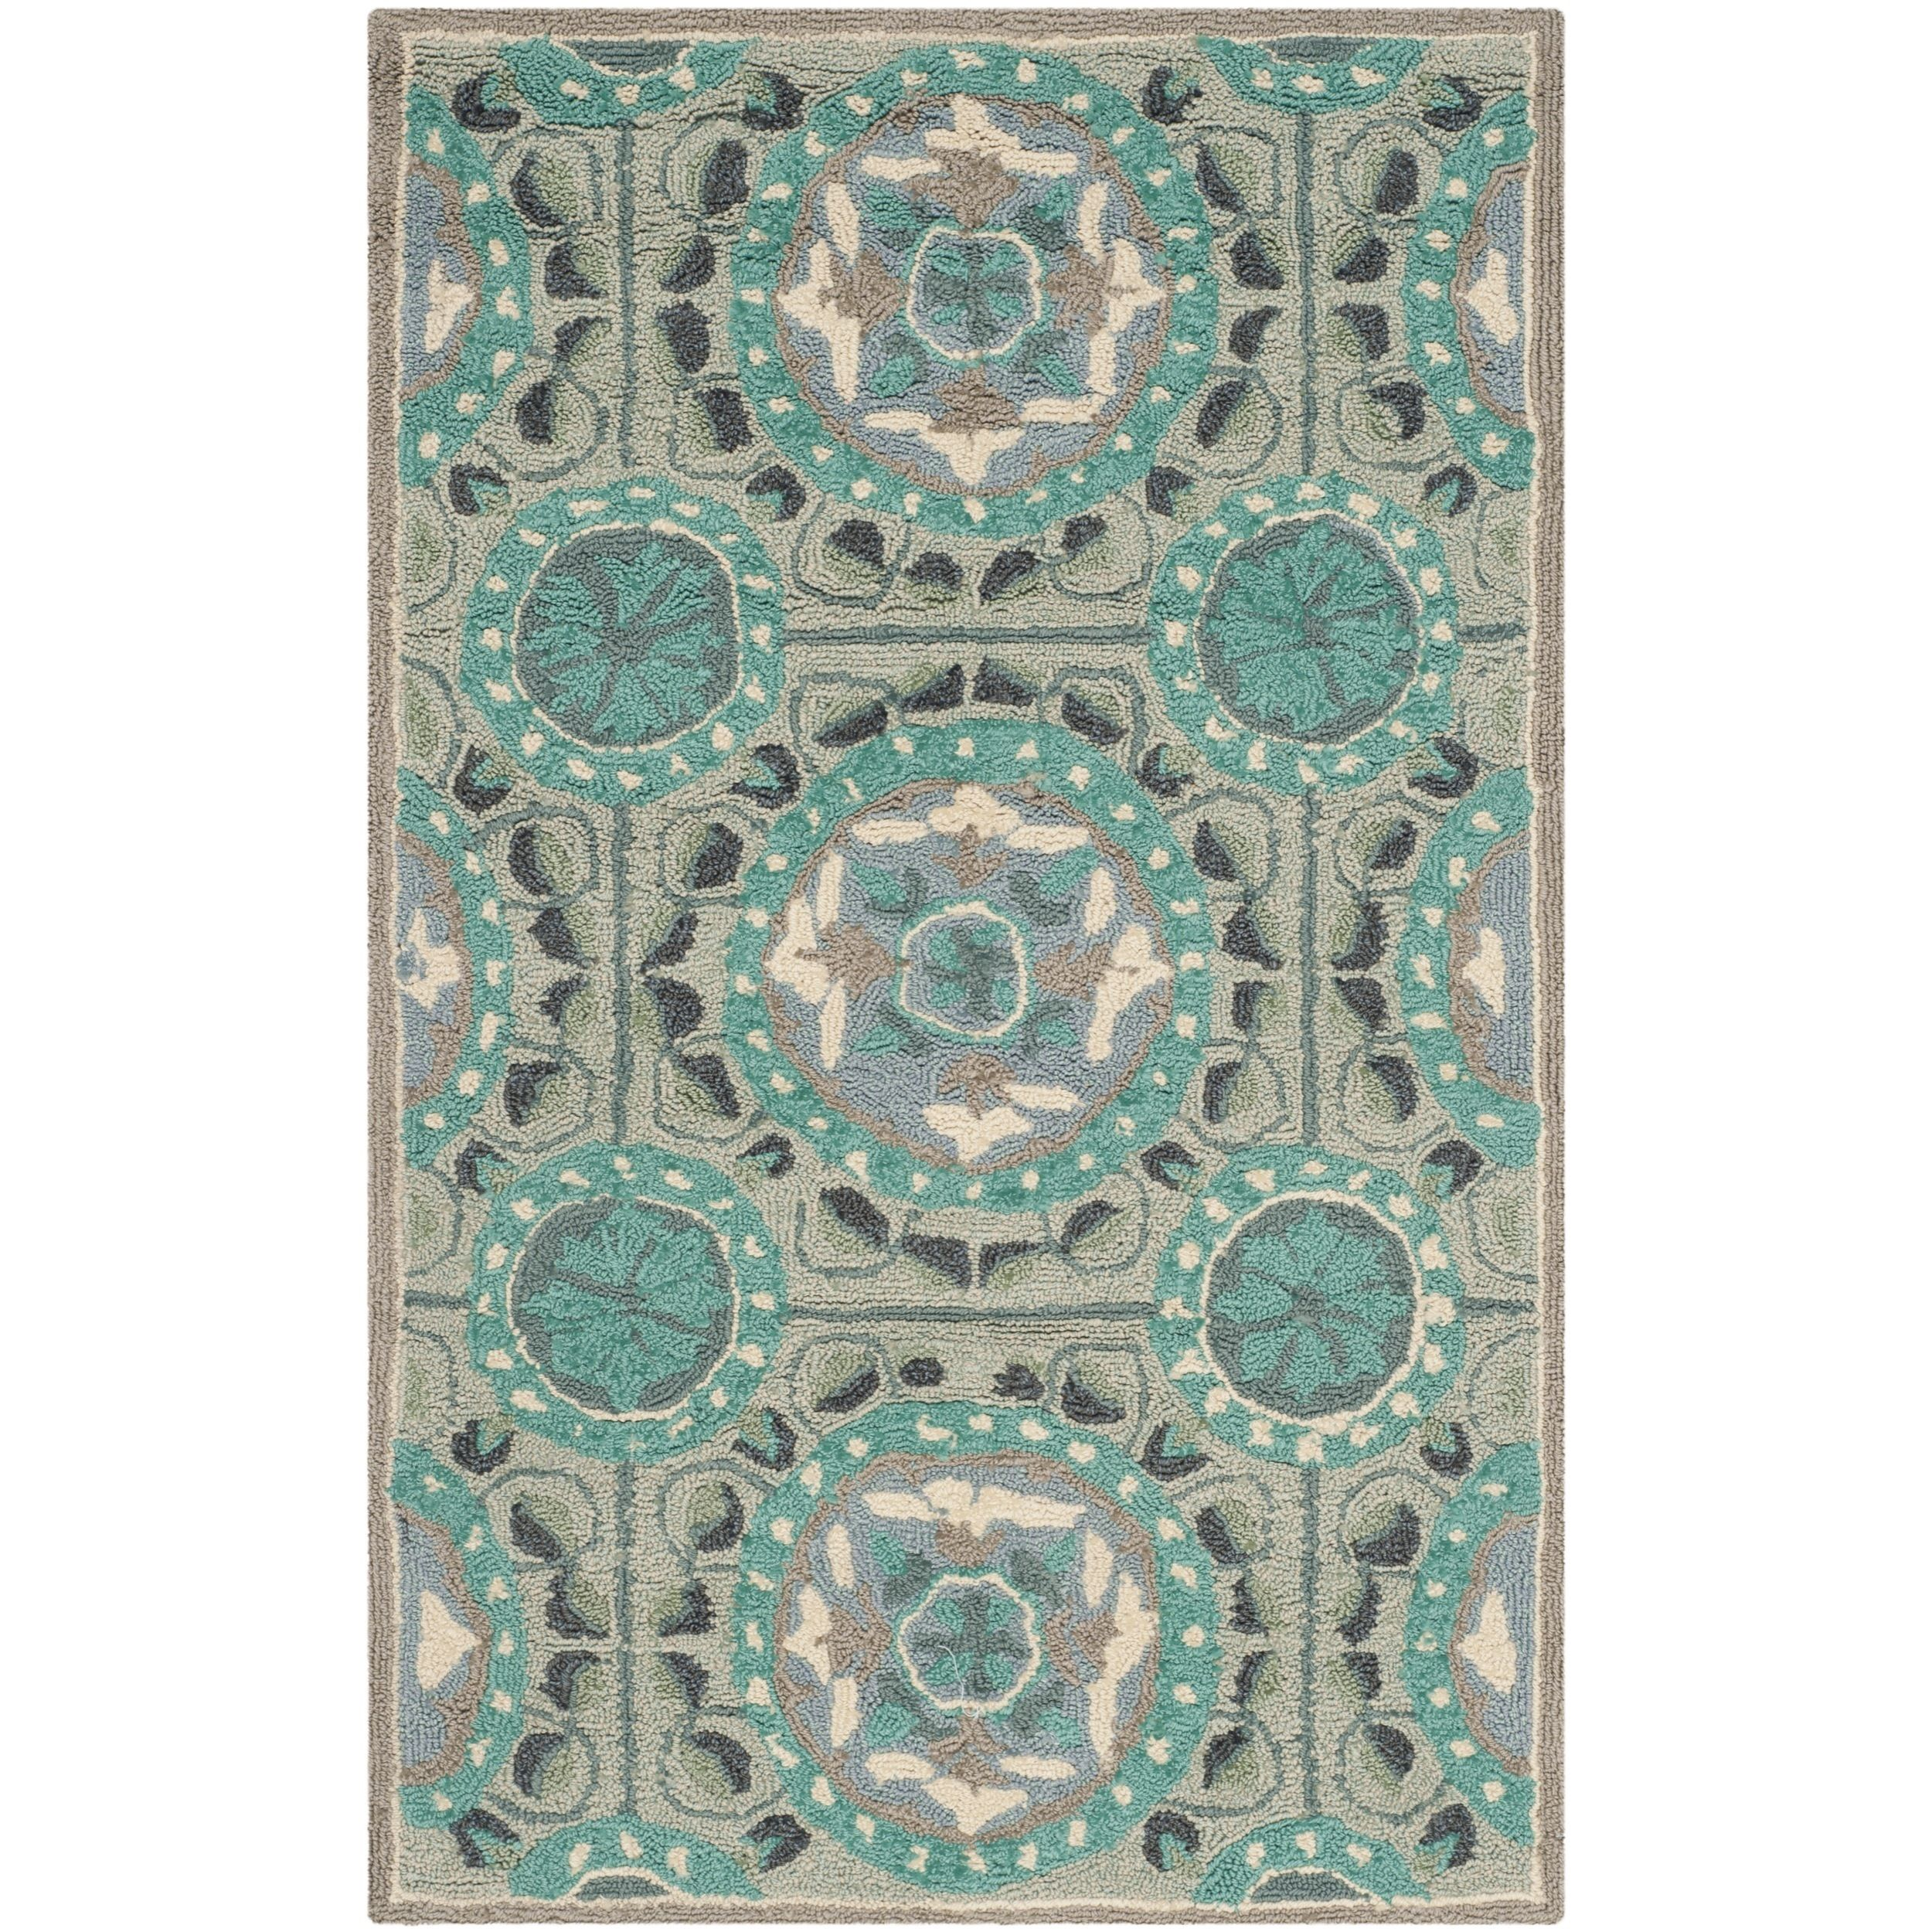 Safavieh Indoor/ Outdoor Four Seasons Mint/ Aqua Rug (2' x 3') (FRS485D-2), Green, Size 2' x 3' (Polypropylene, Floral)